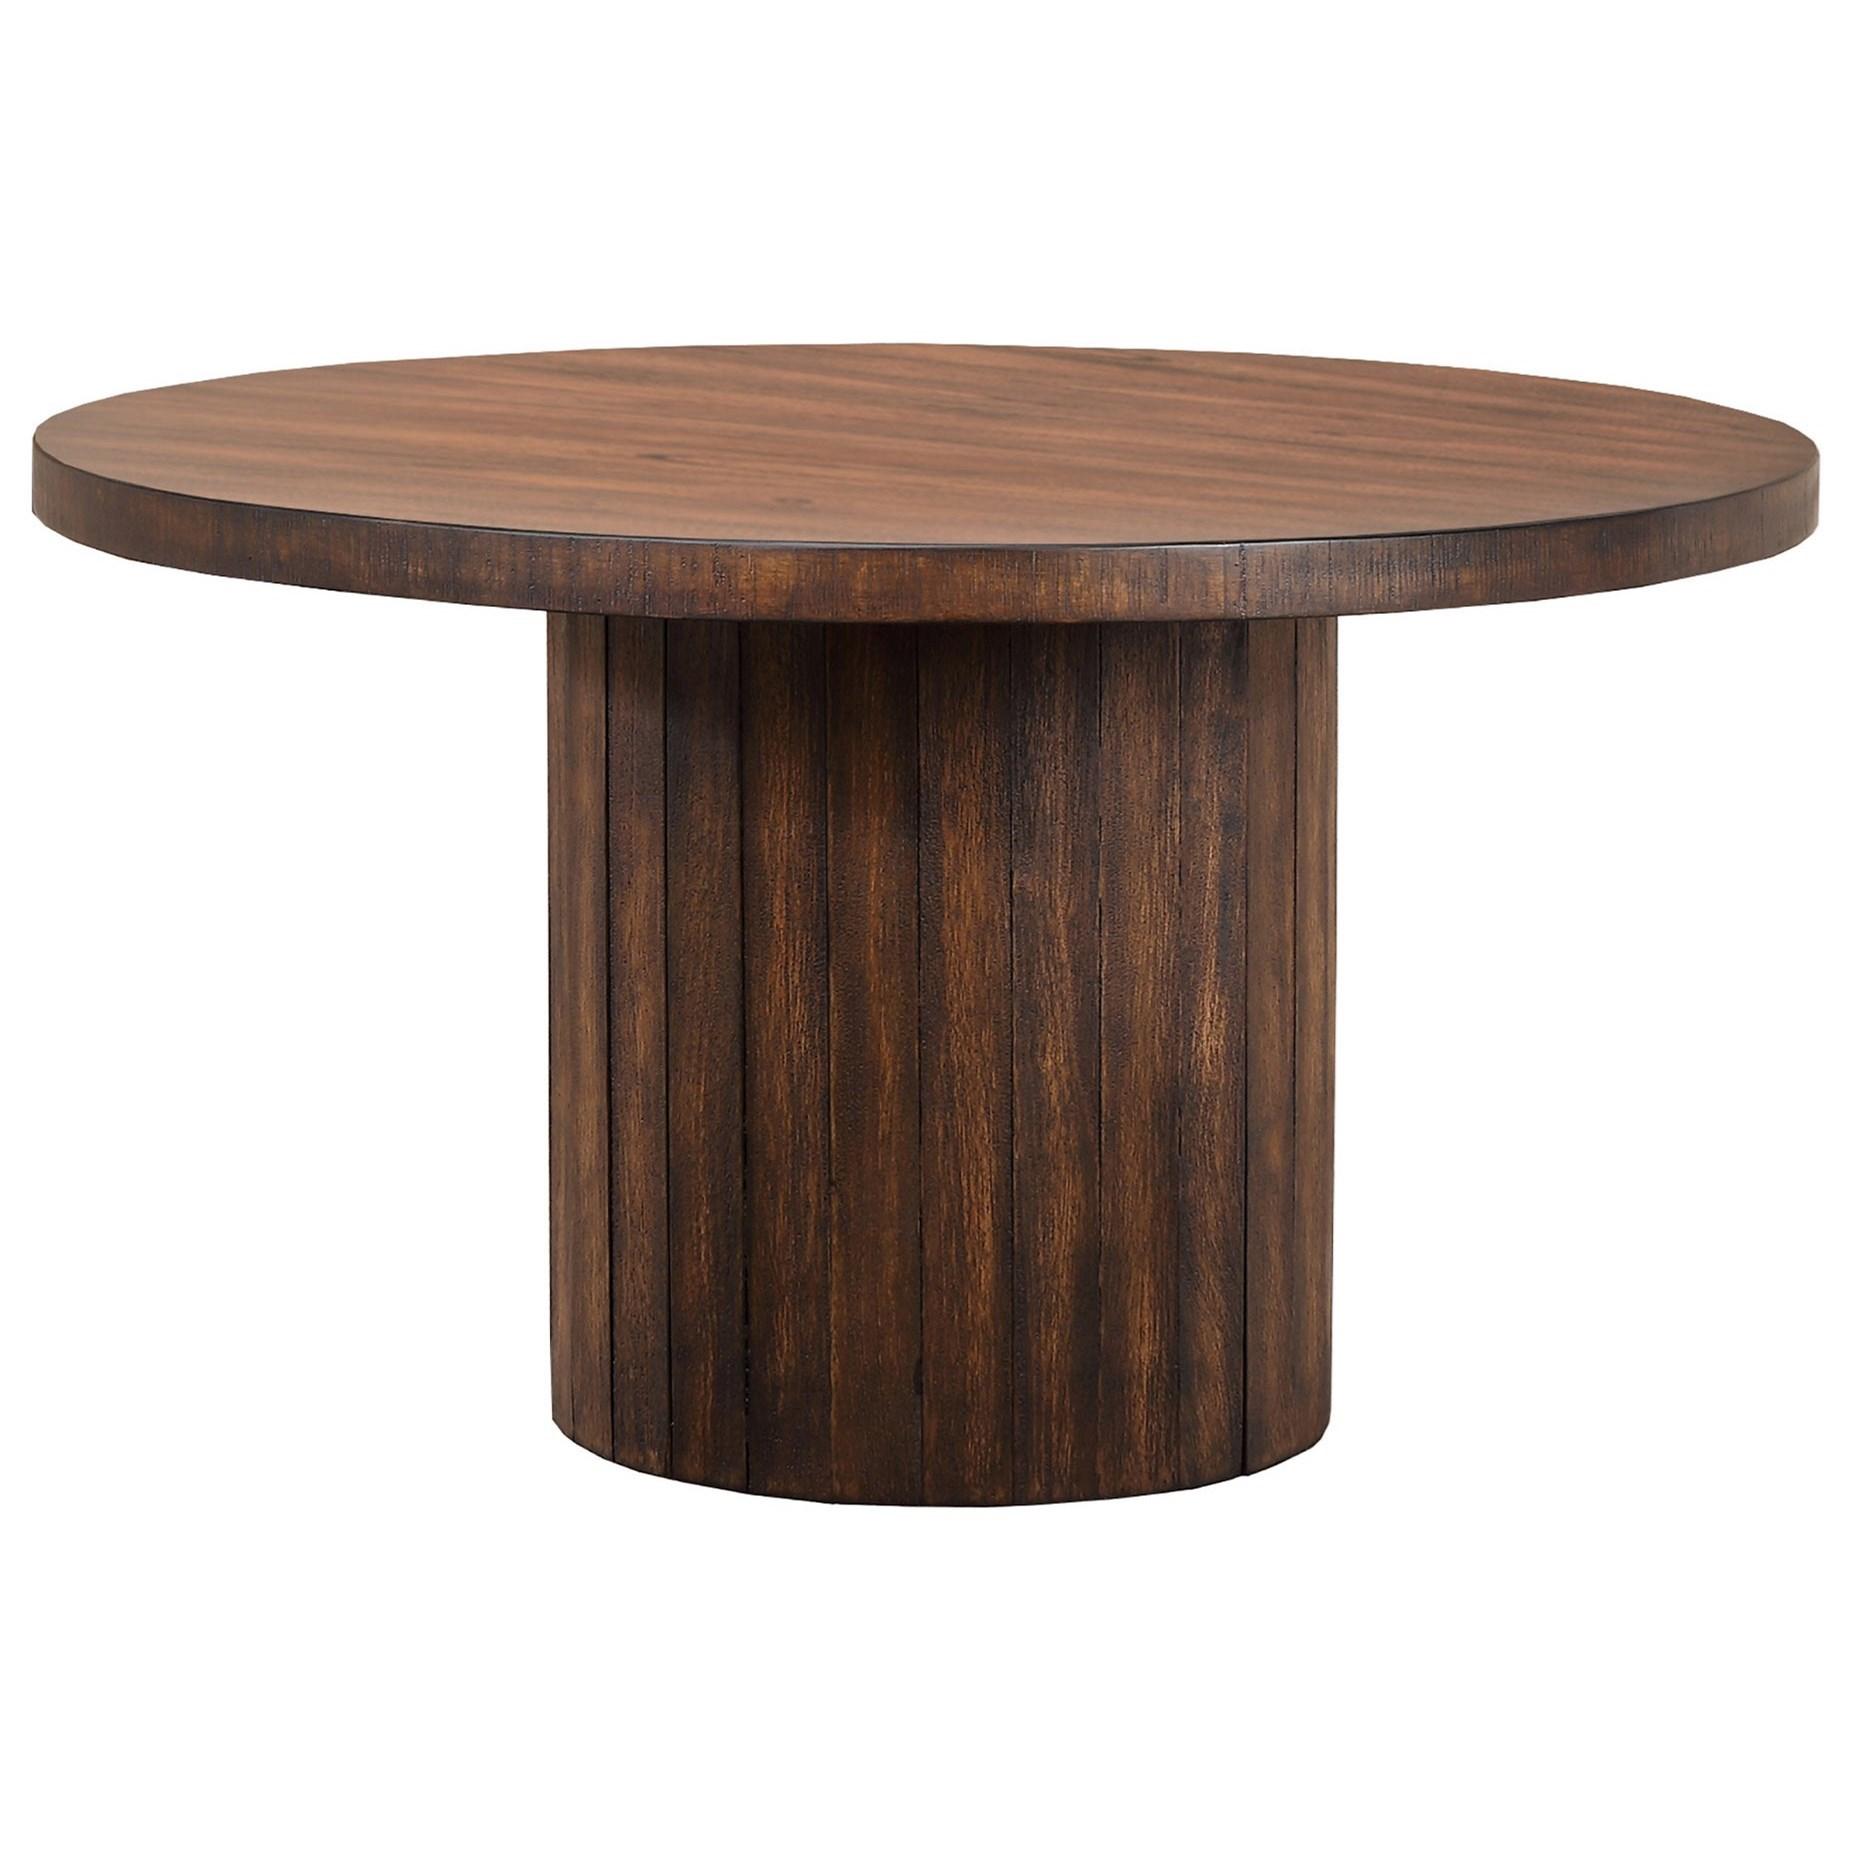 Round Barrel Base Table